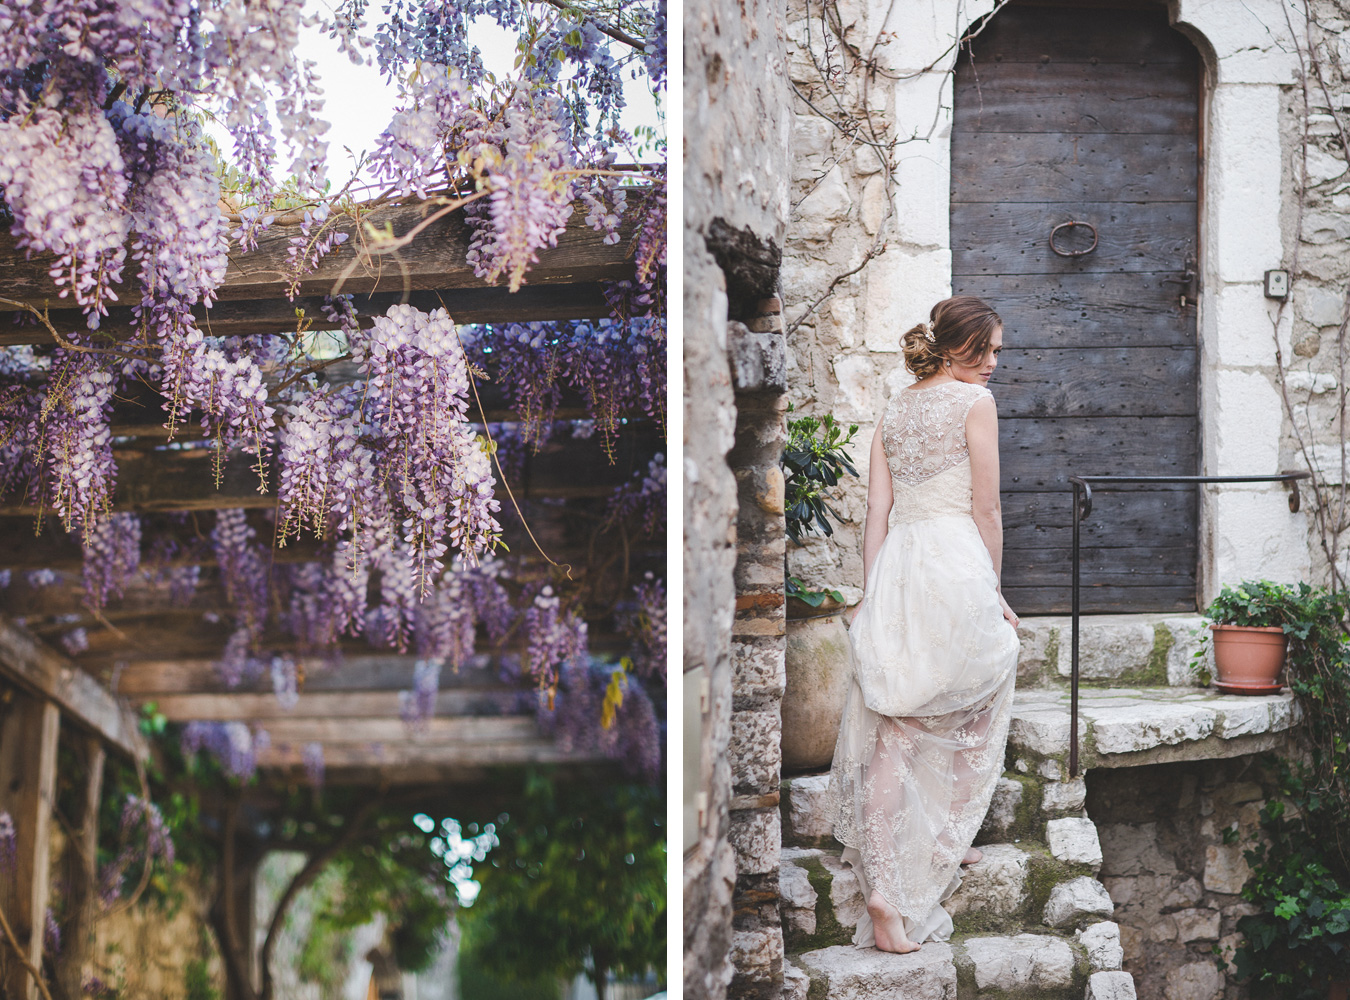 012-fotograf-tone-tvedt-bryllup-i-utlandet.jpg